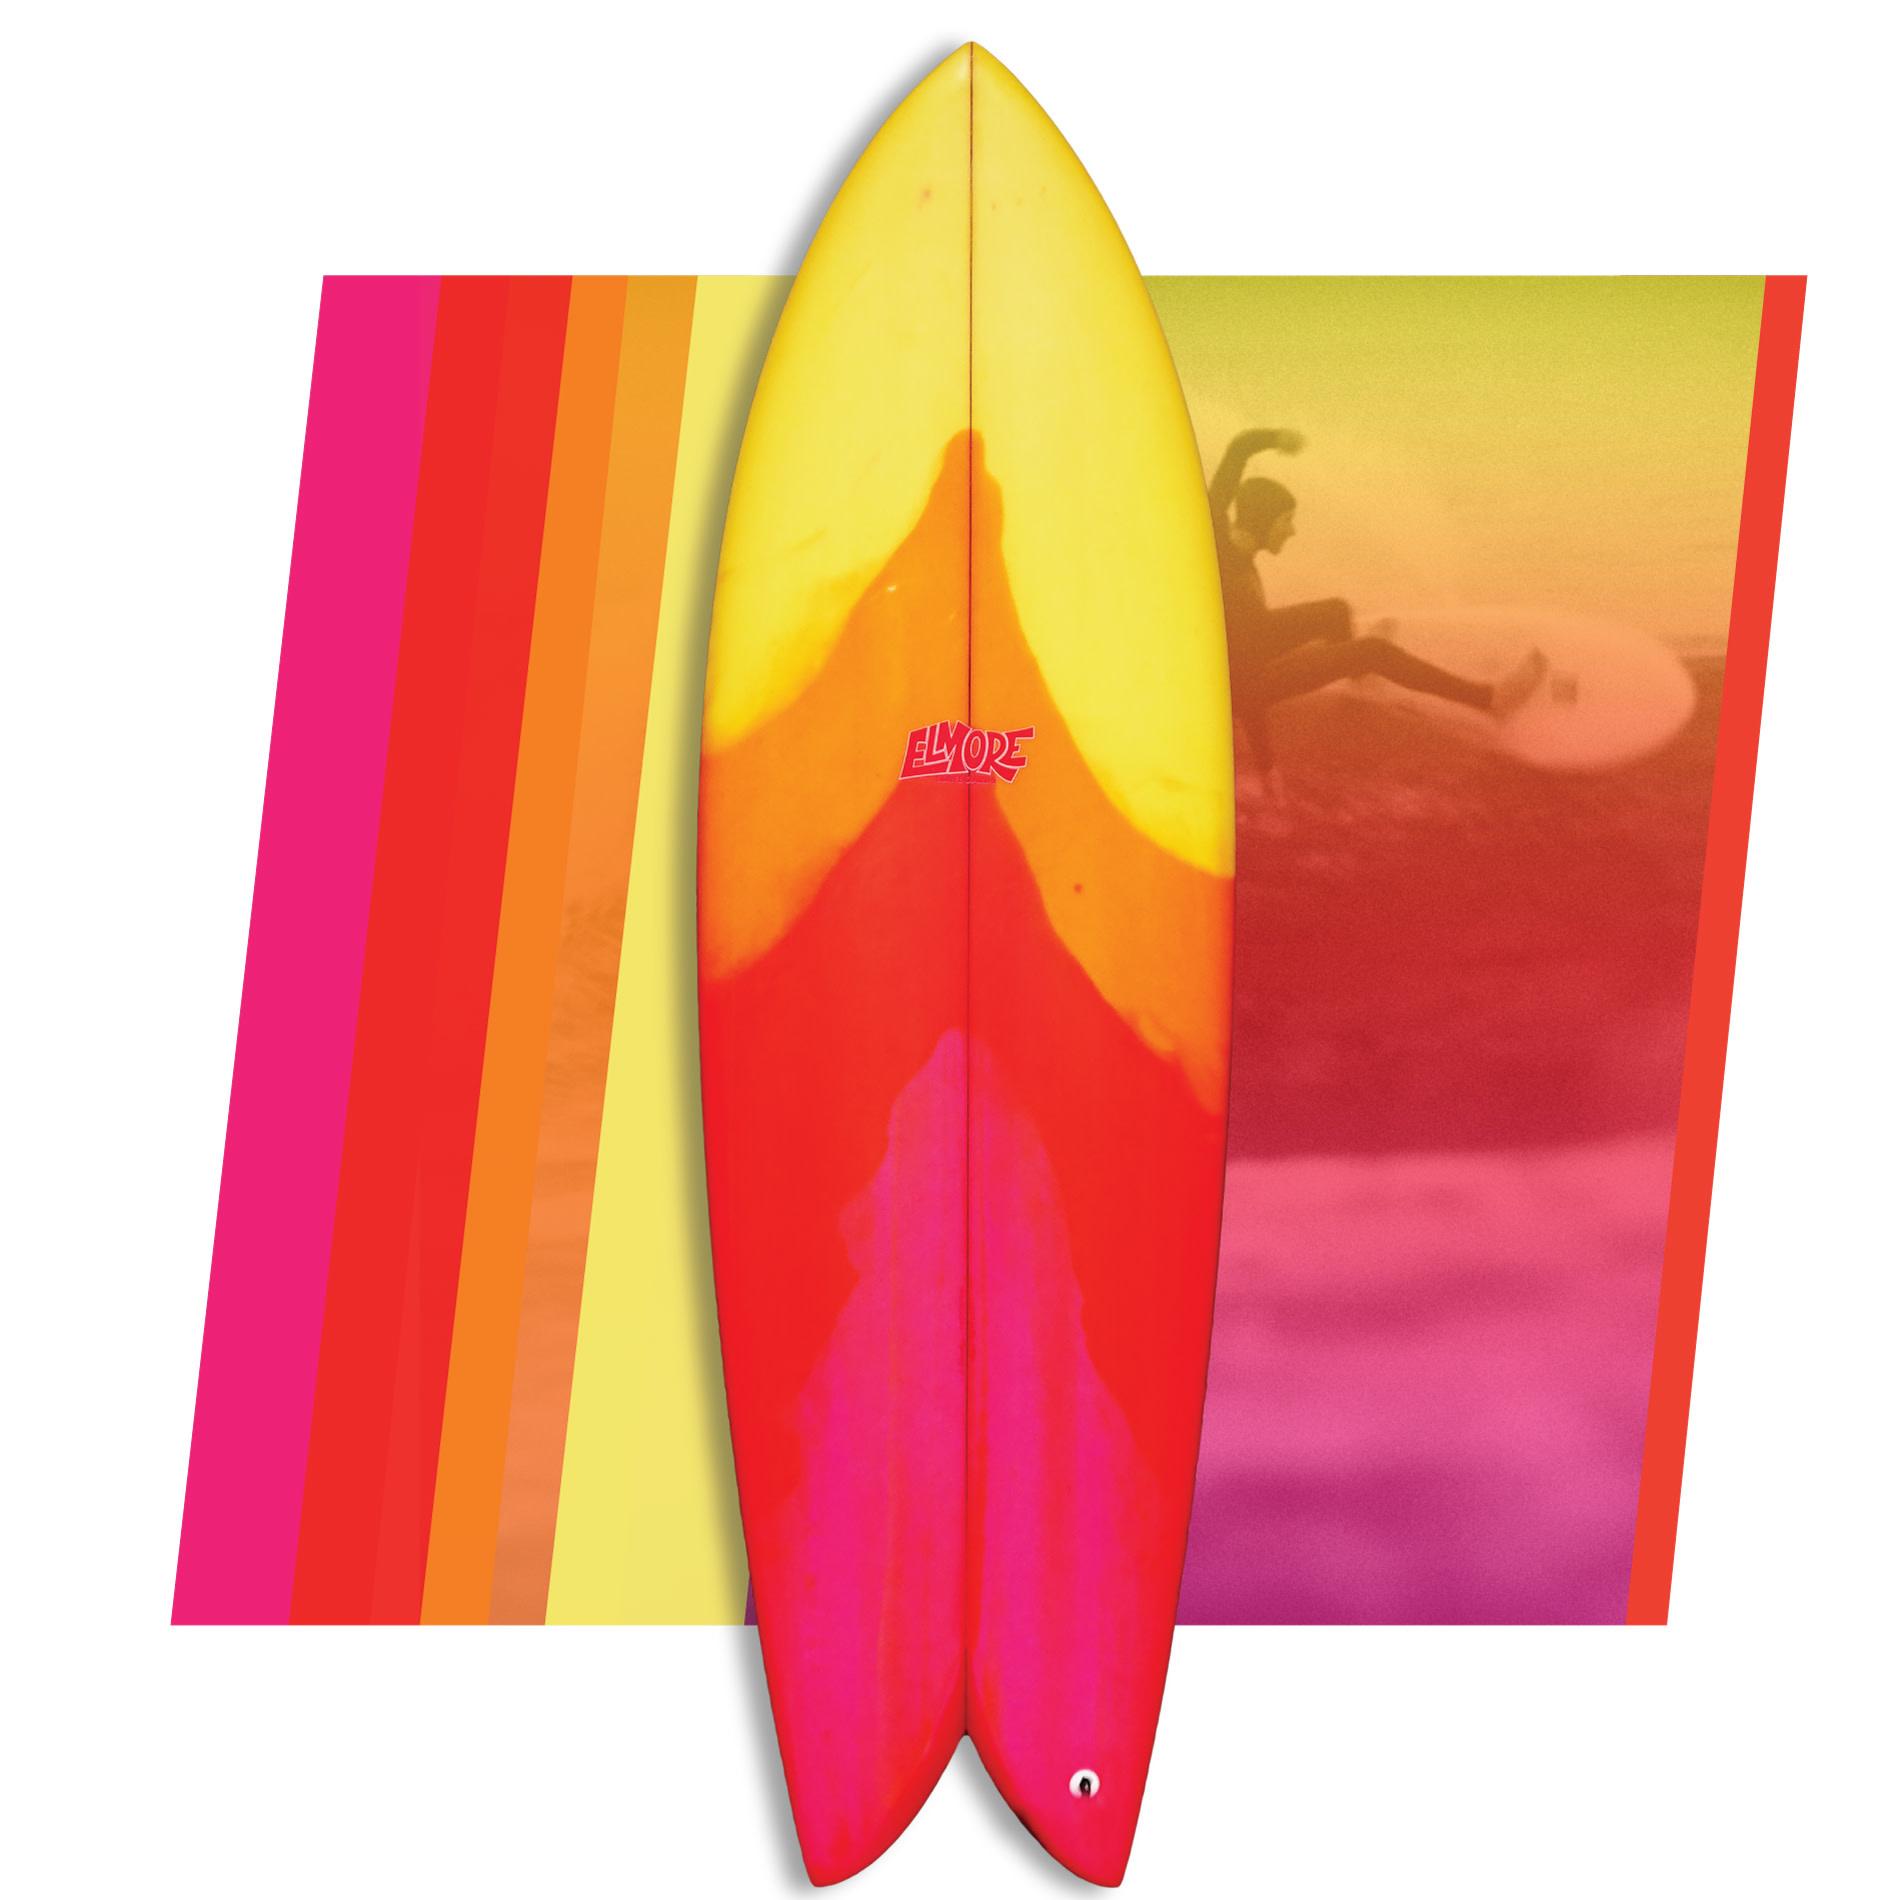 Troy Elmore Frye'd Fish 5'7 // SOLD